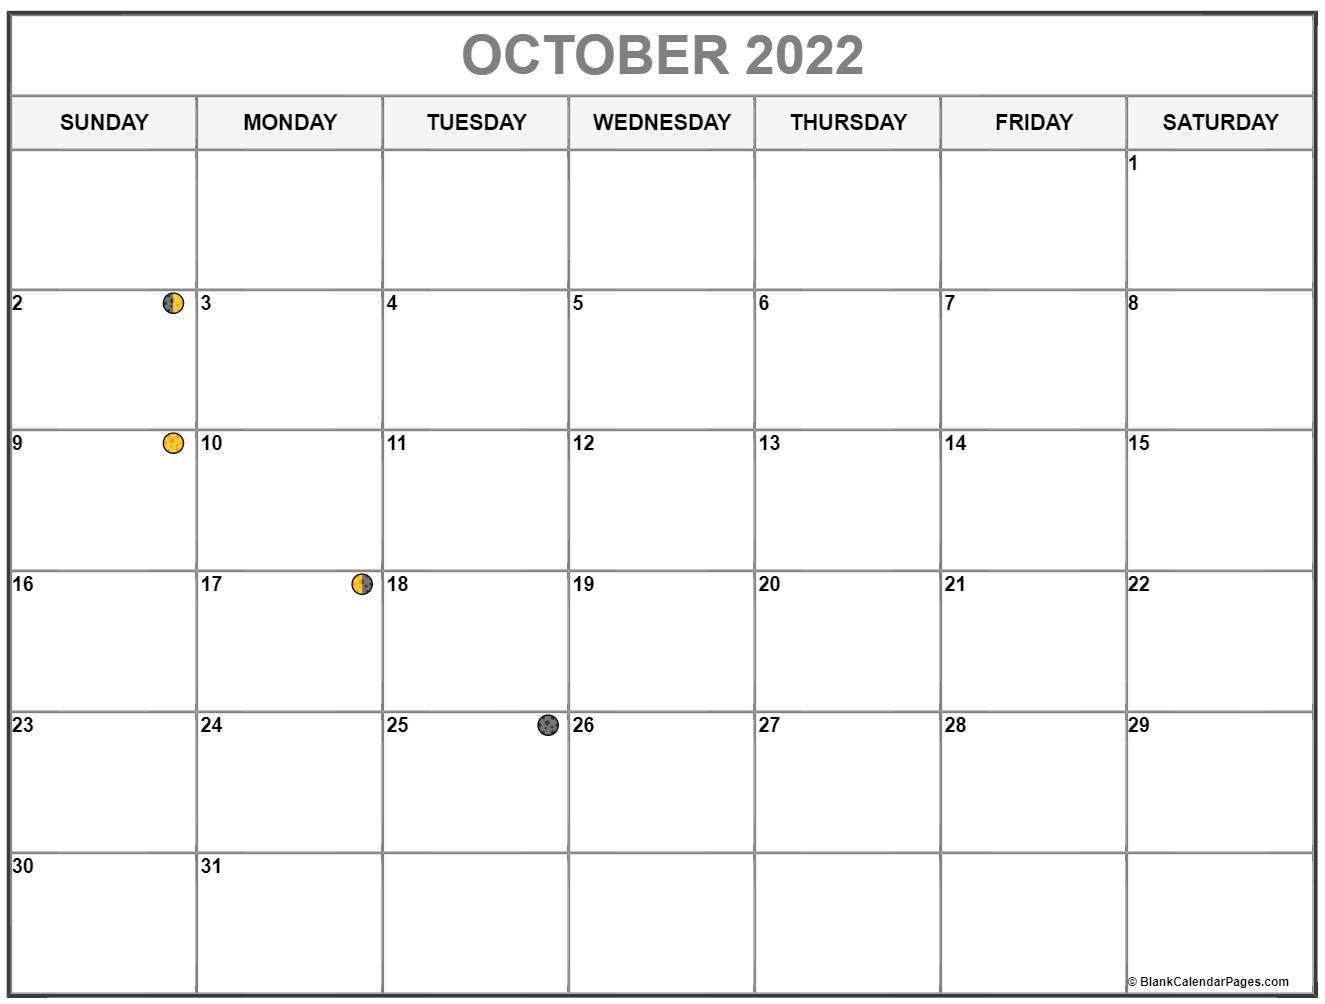 October 2022 lunar calendar. Moon phases with USA holidays